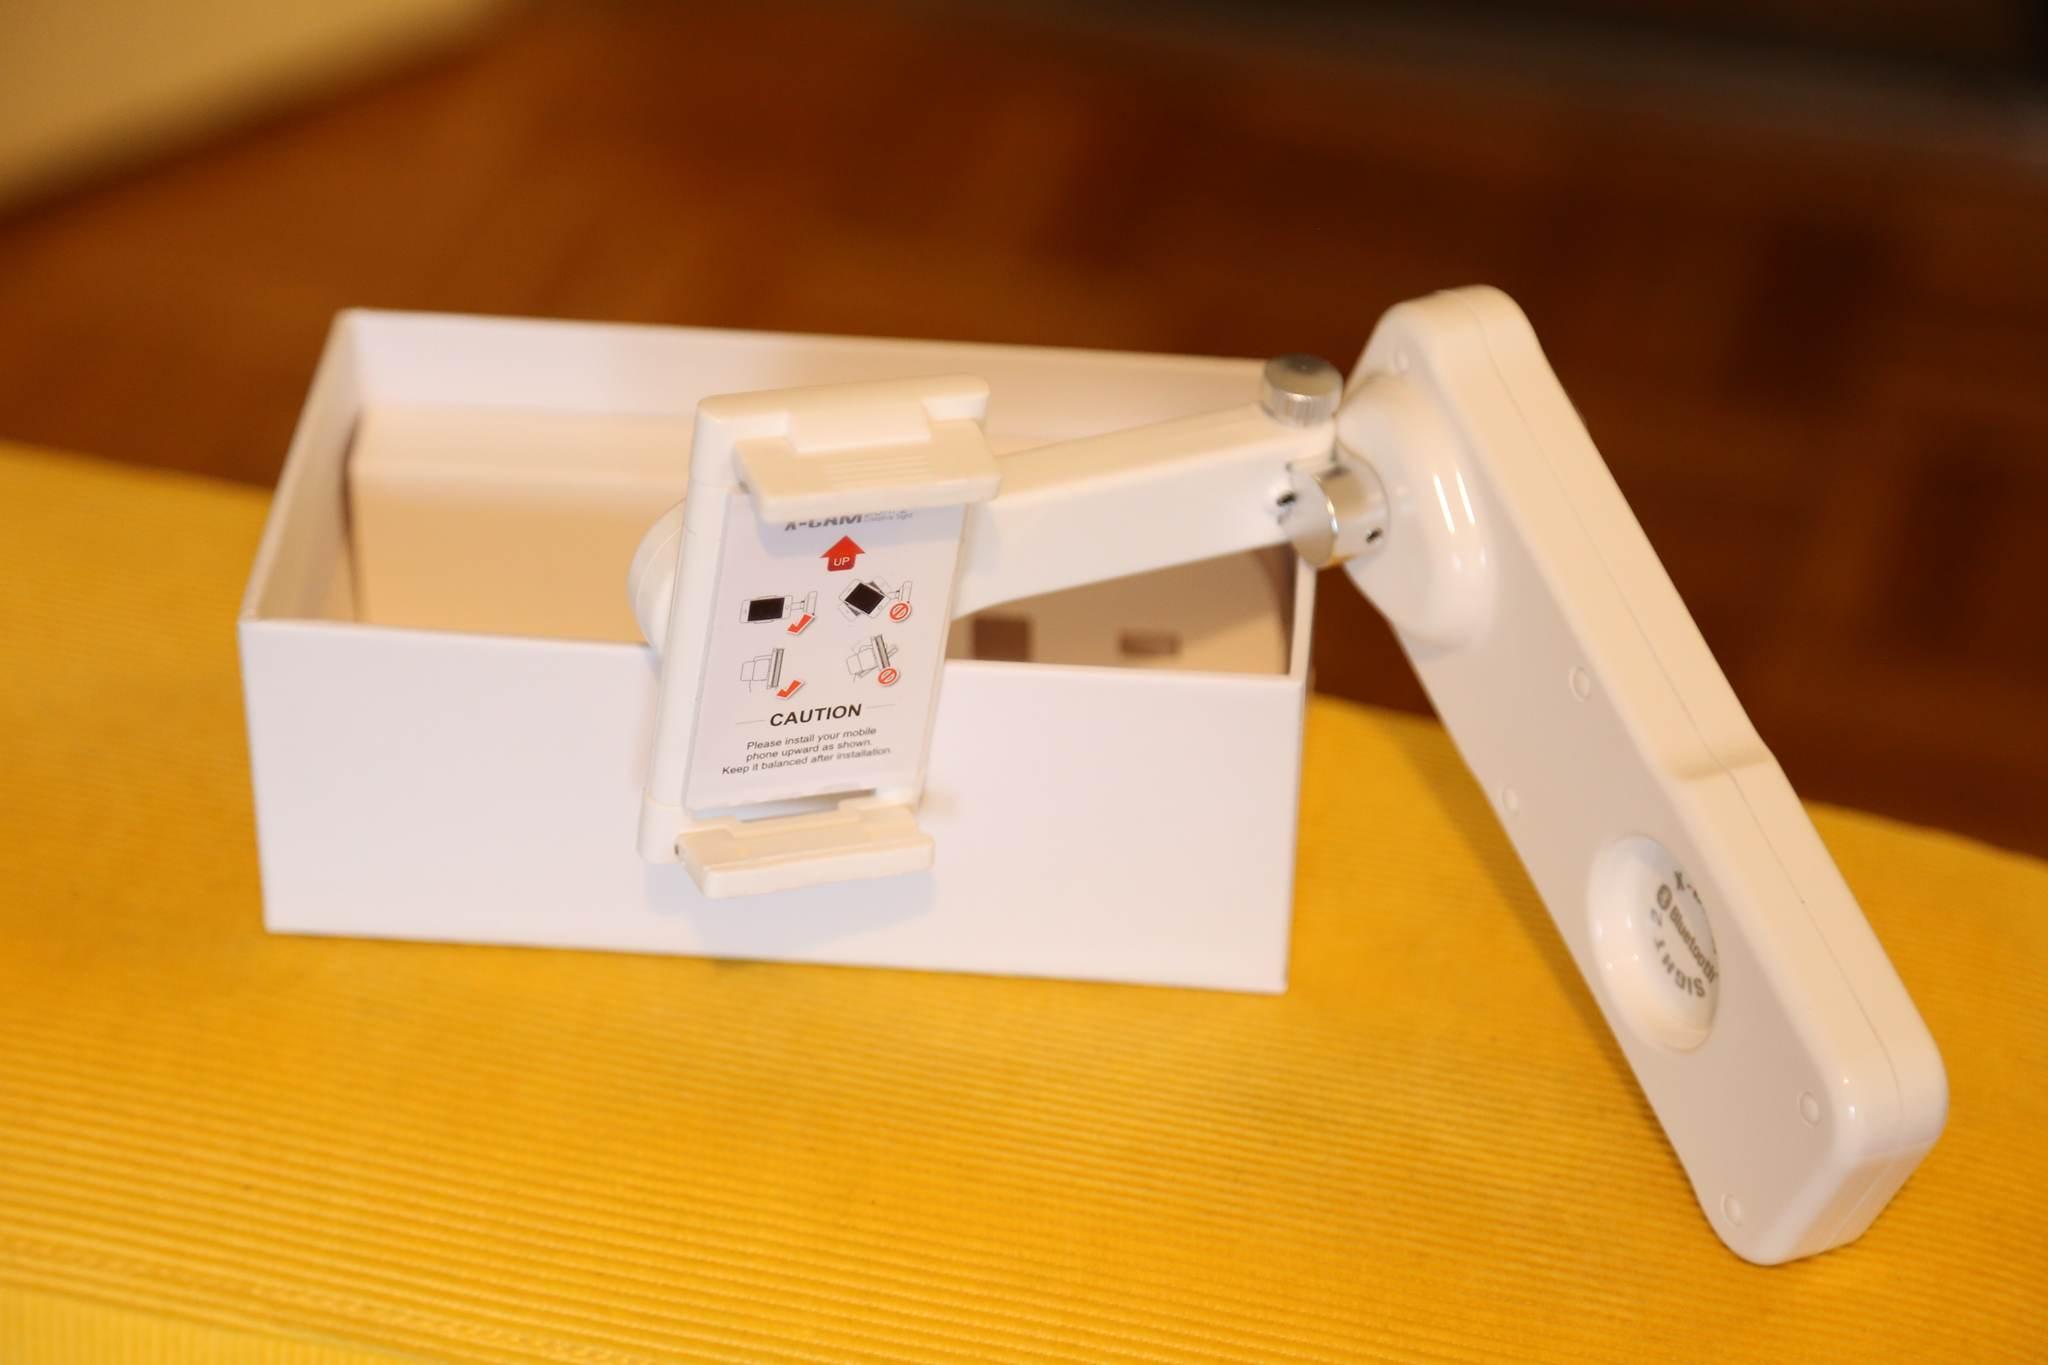 x-cam-sight2-2-tengelyes-telefon-mobiltelefon-gimbal-teszt-olcso-kepstabilizalas-mobil-kamera-2-axis-stabilizer-bluetooth-self-timer-brushless-handheld-gimbal-01.jpg